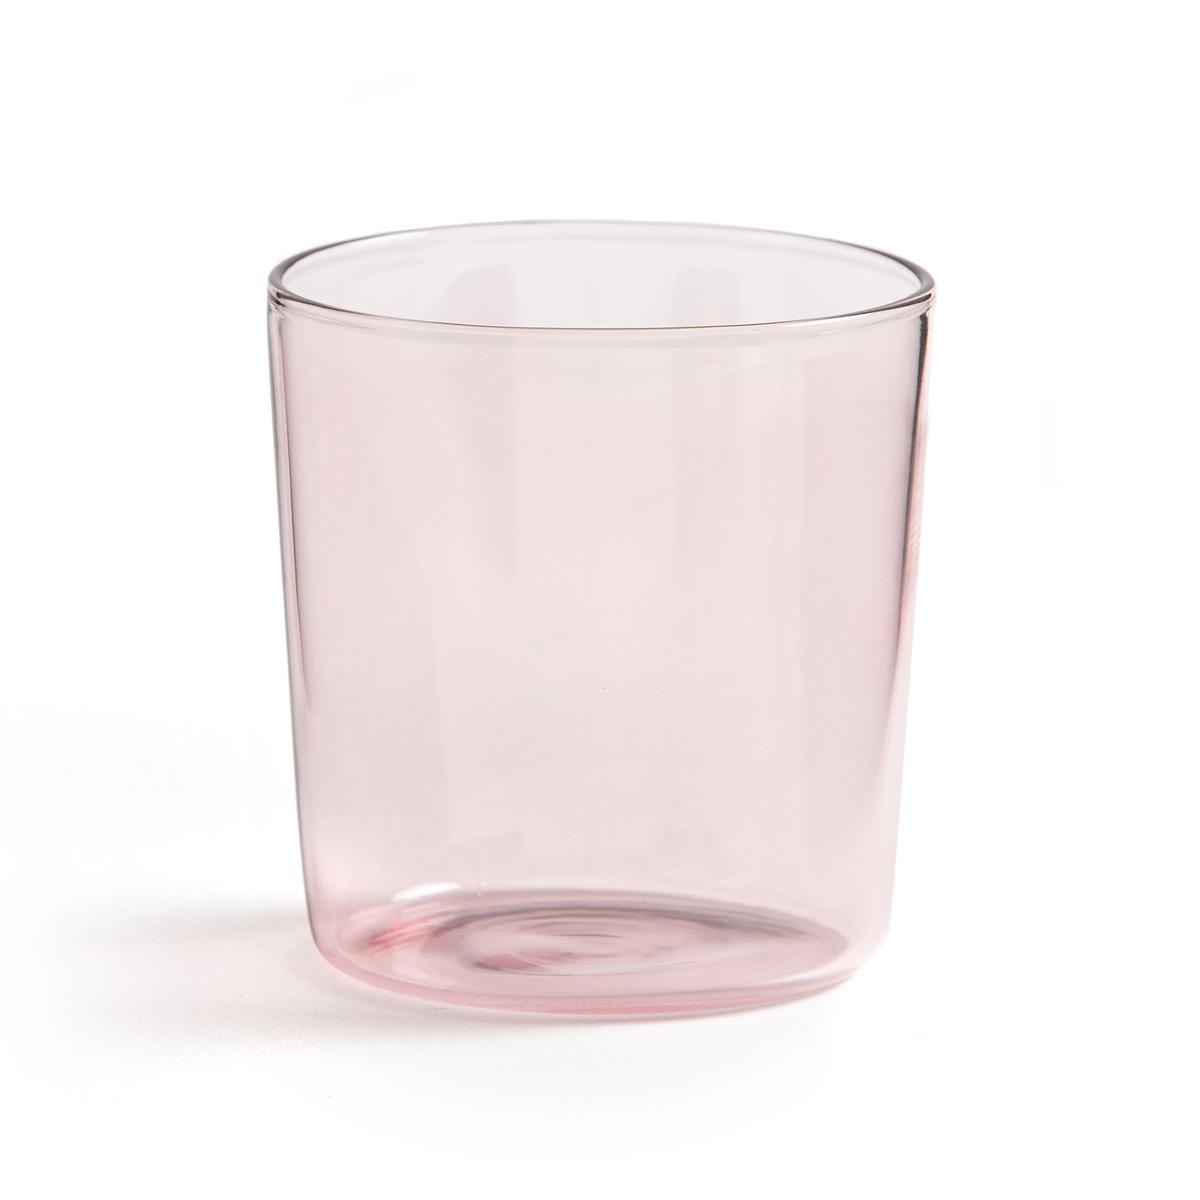 6 стаканов, MIKEL чаша la rochere baikal комплект из 6 шт 620801